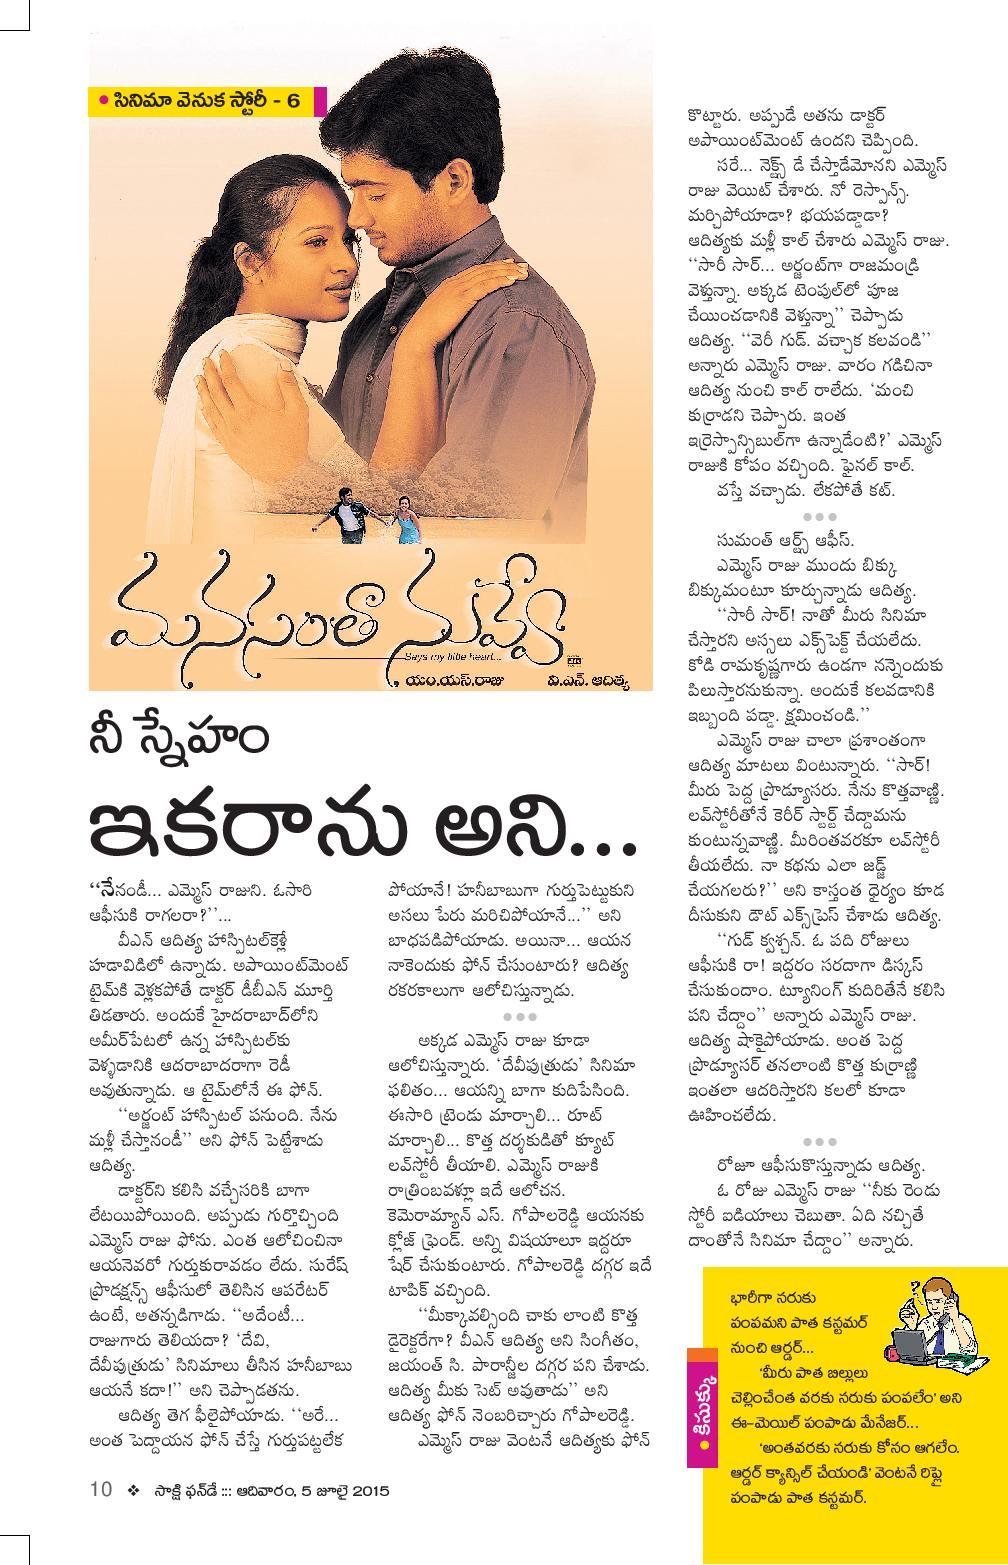 Cinema Venuka Story_Manasantha Nuvve_Funday (05-07-2015)-page-001